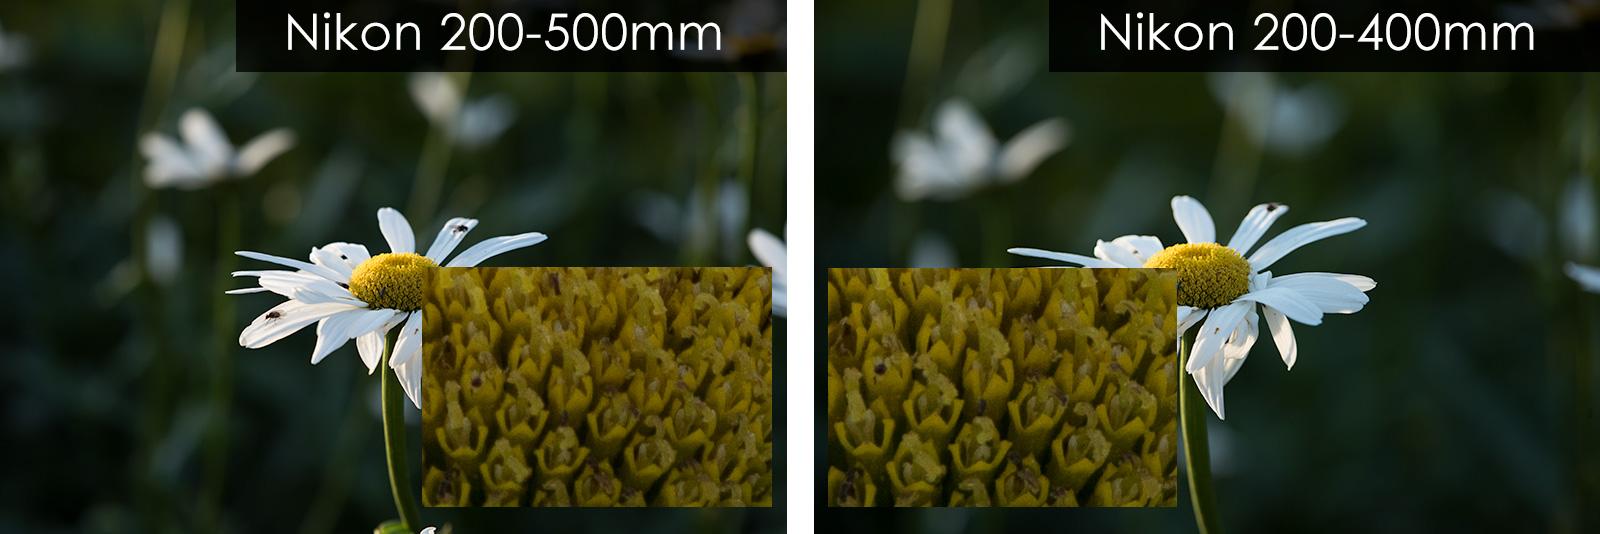 comparison nikon 200-500mm and nikon 200-400mm